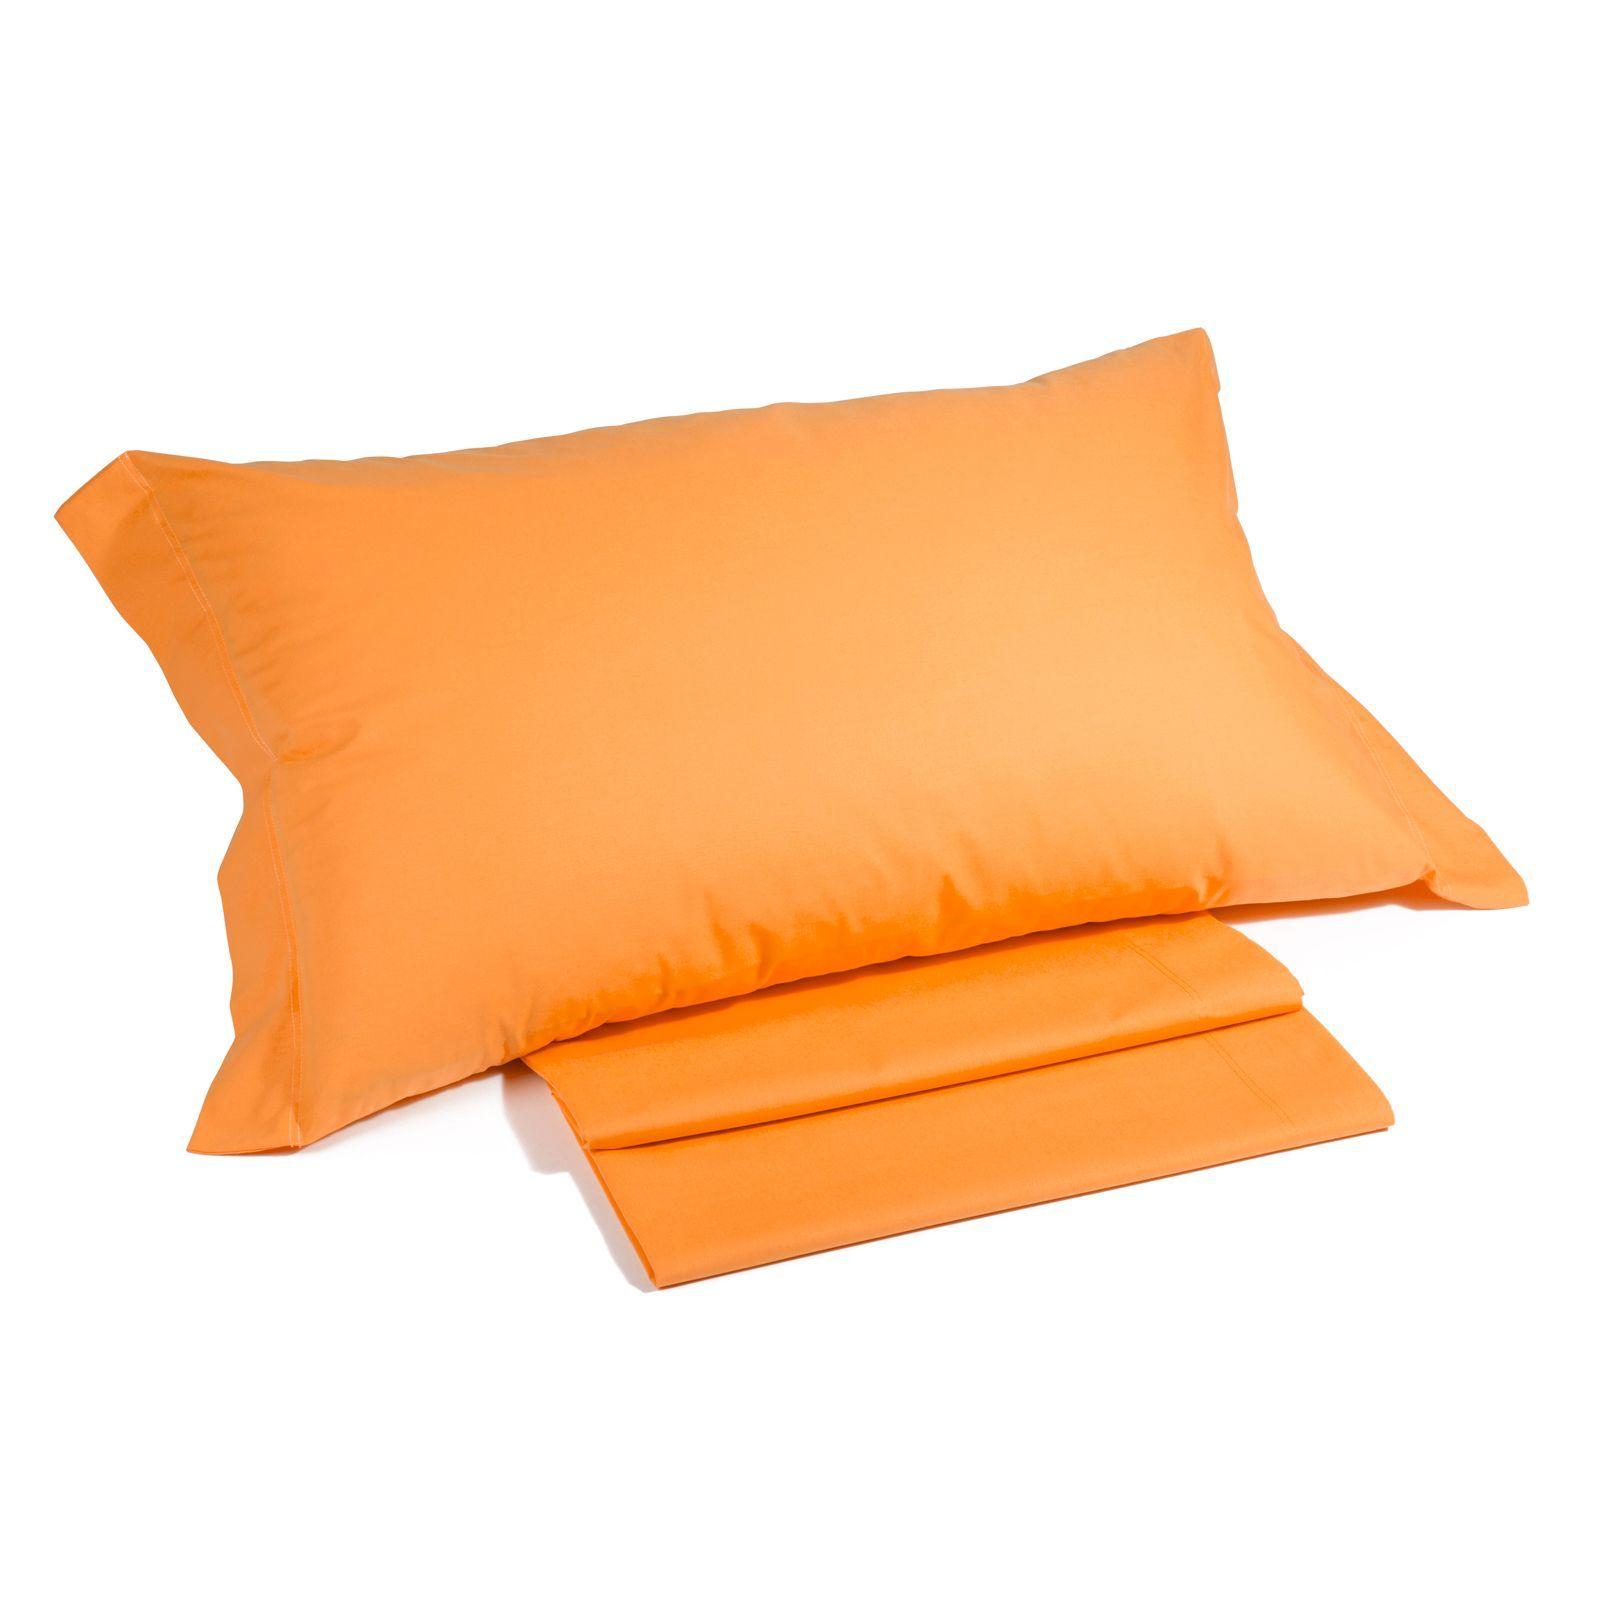 Наволочки для сна Наволочки 2шт 52х82 Caleffi Tinta Unita оранжевые komplekt-navolochek-caleffi-tinta-unita-oranzhevyy-italiya.jpg